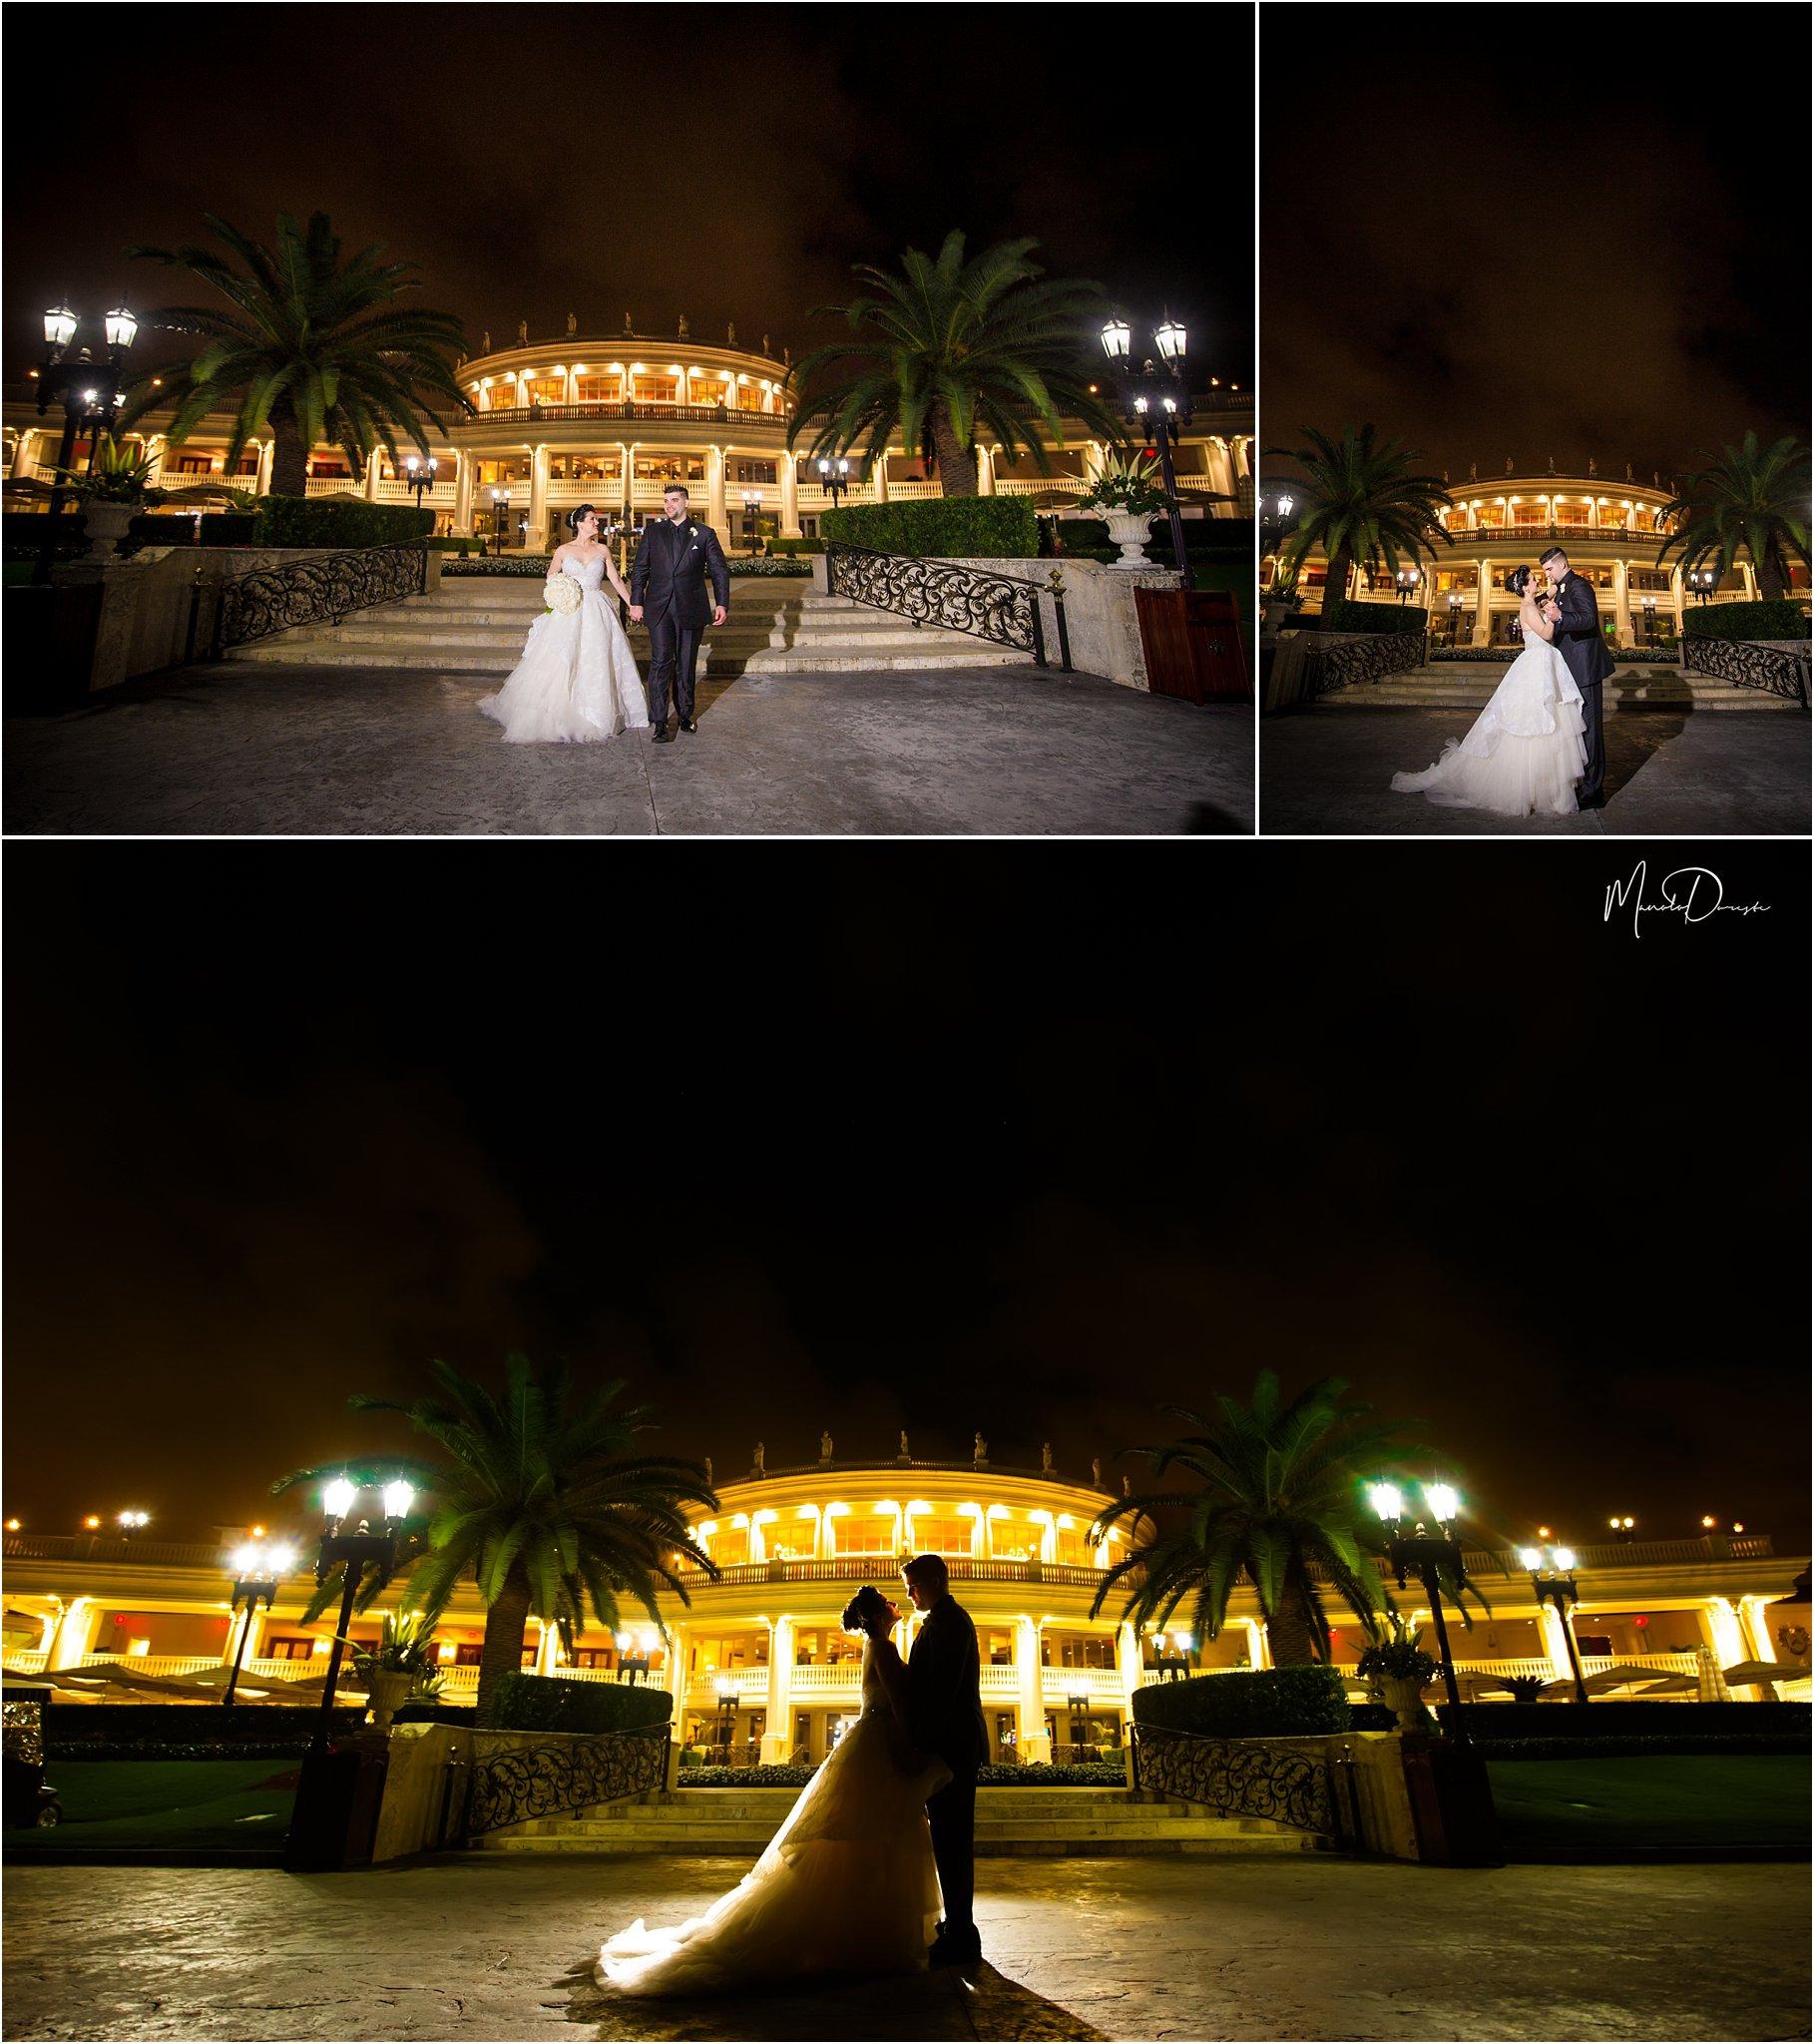 00975_ManoloDoreste_InFocusStudios_Wedding_Family_Photography_Miami_MiamiPhotographer.jpg